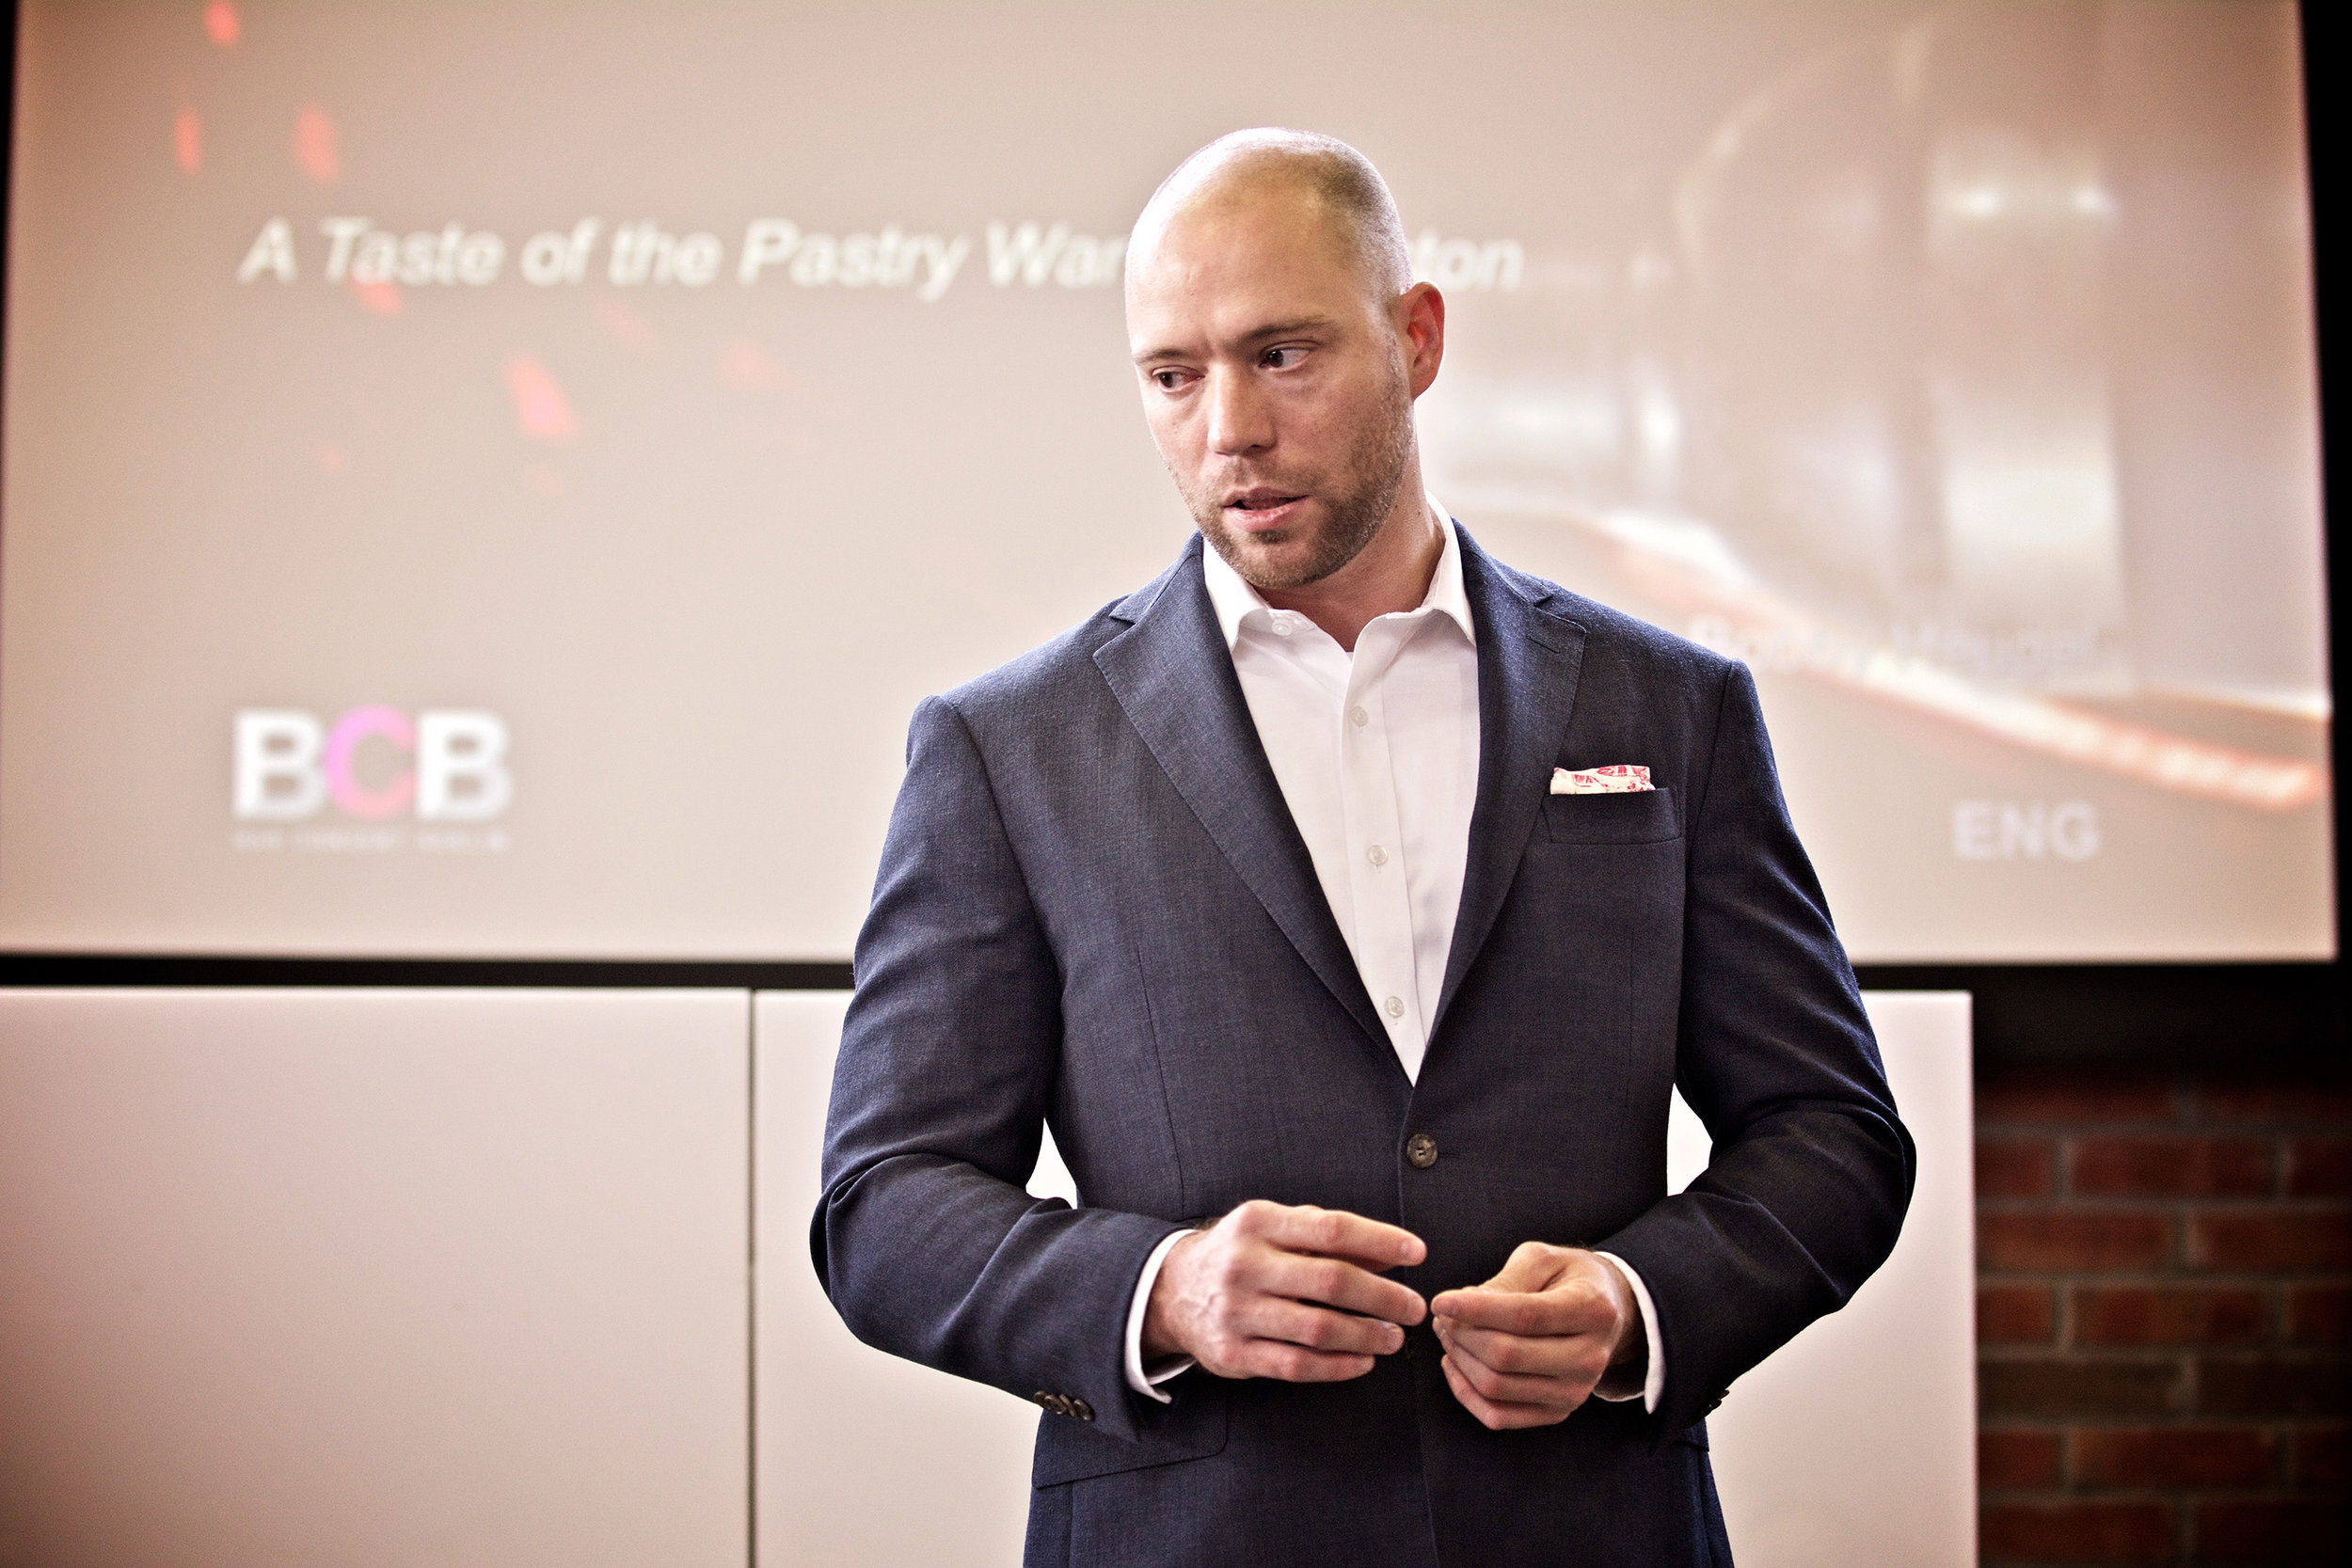 Bobby Heugel, photo by Gili Shani for BCB